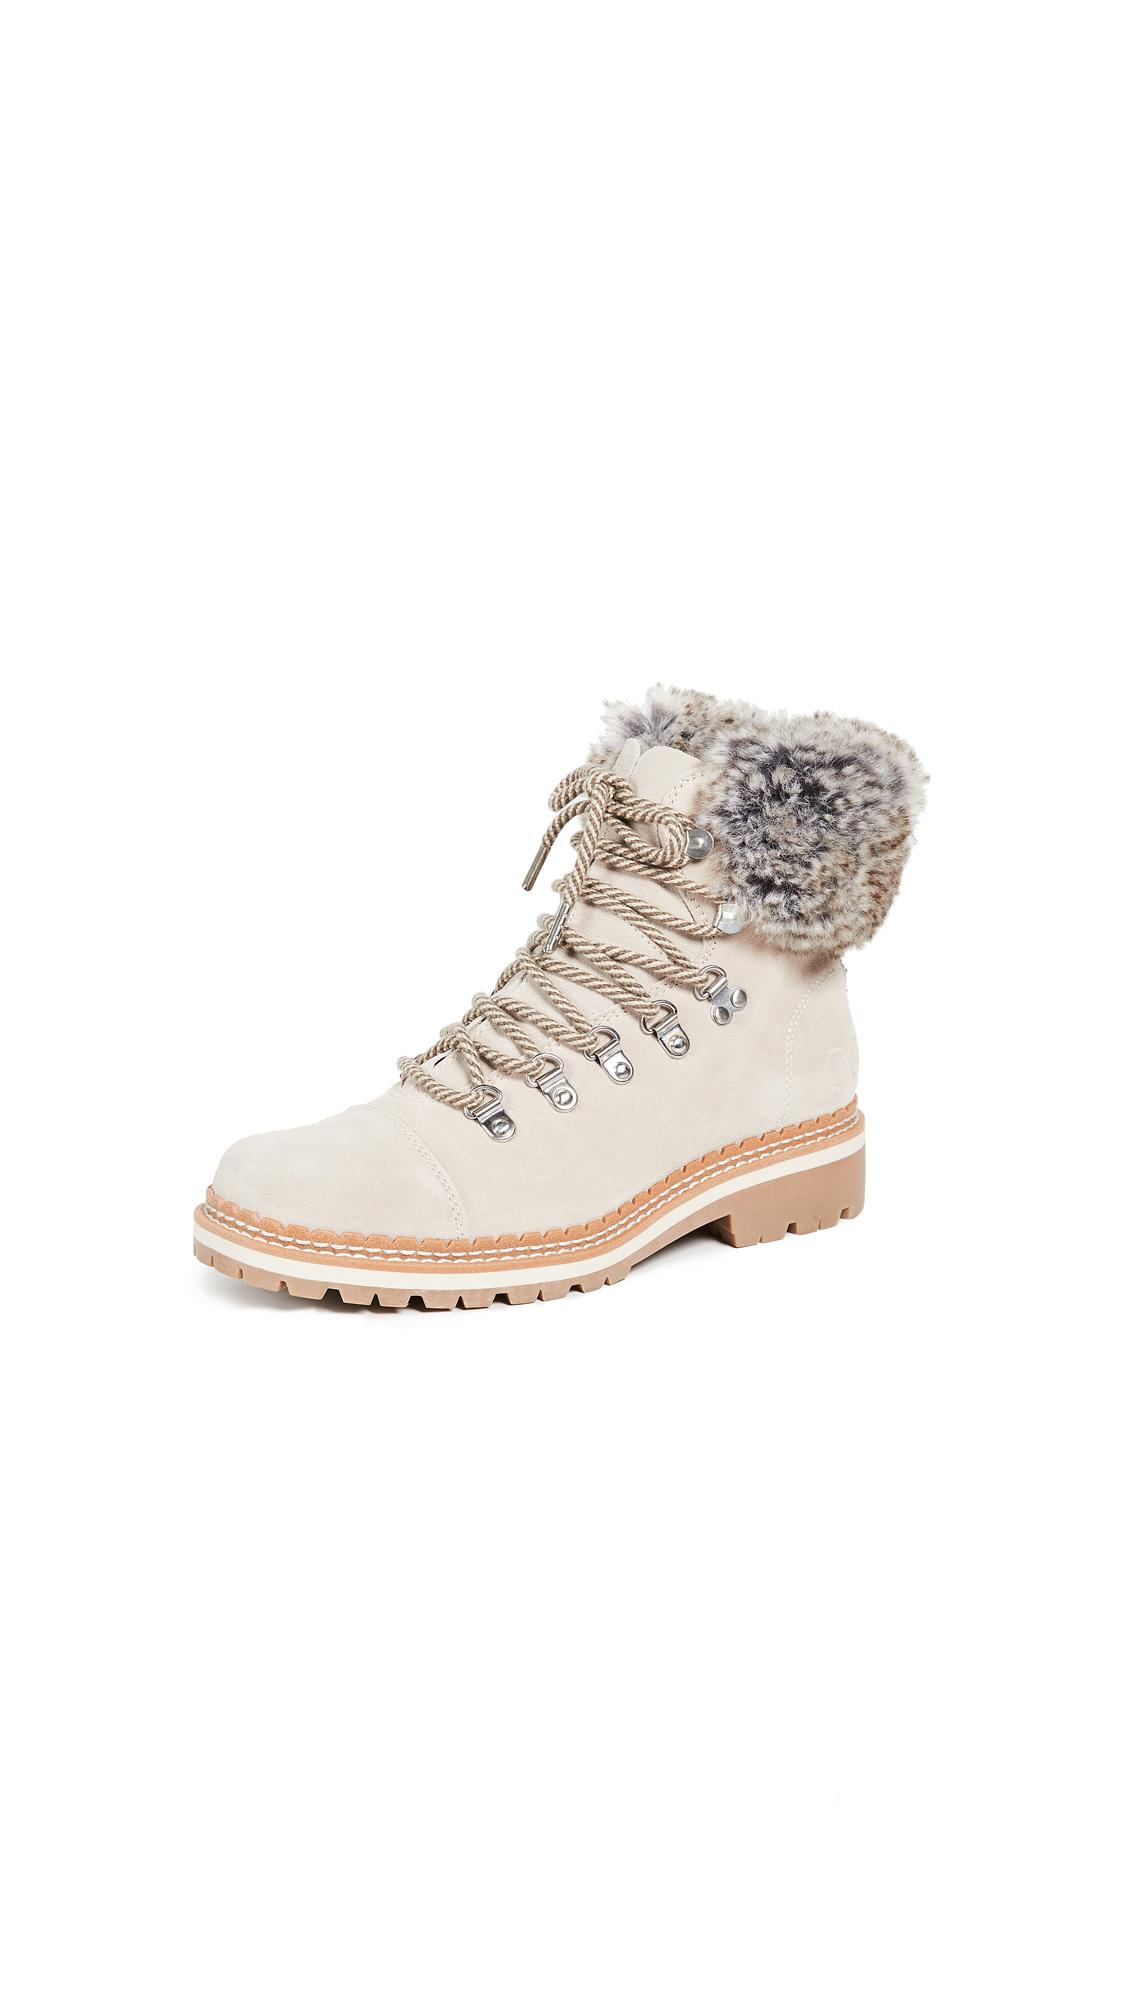 Sam Edelman Bowen Boots - Bistro/Grey Multi